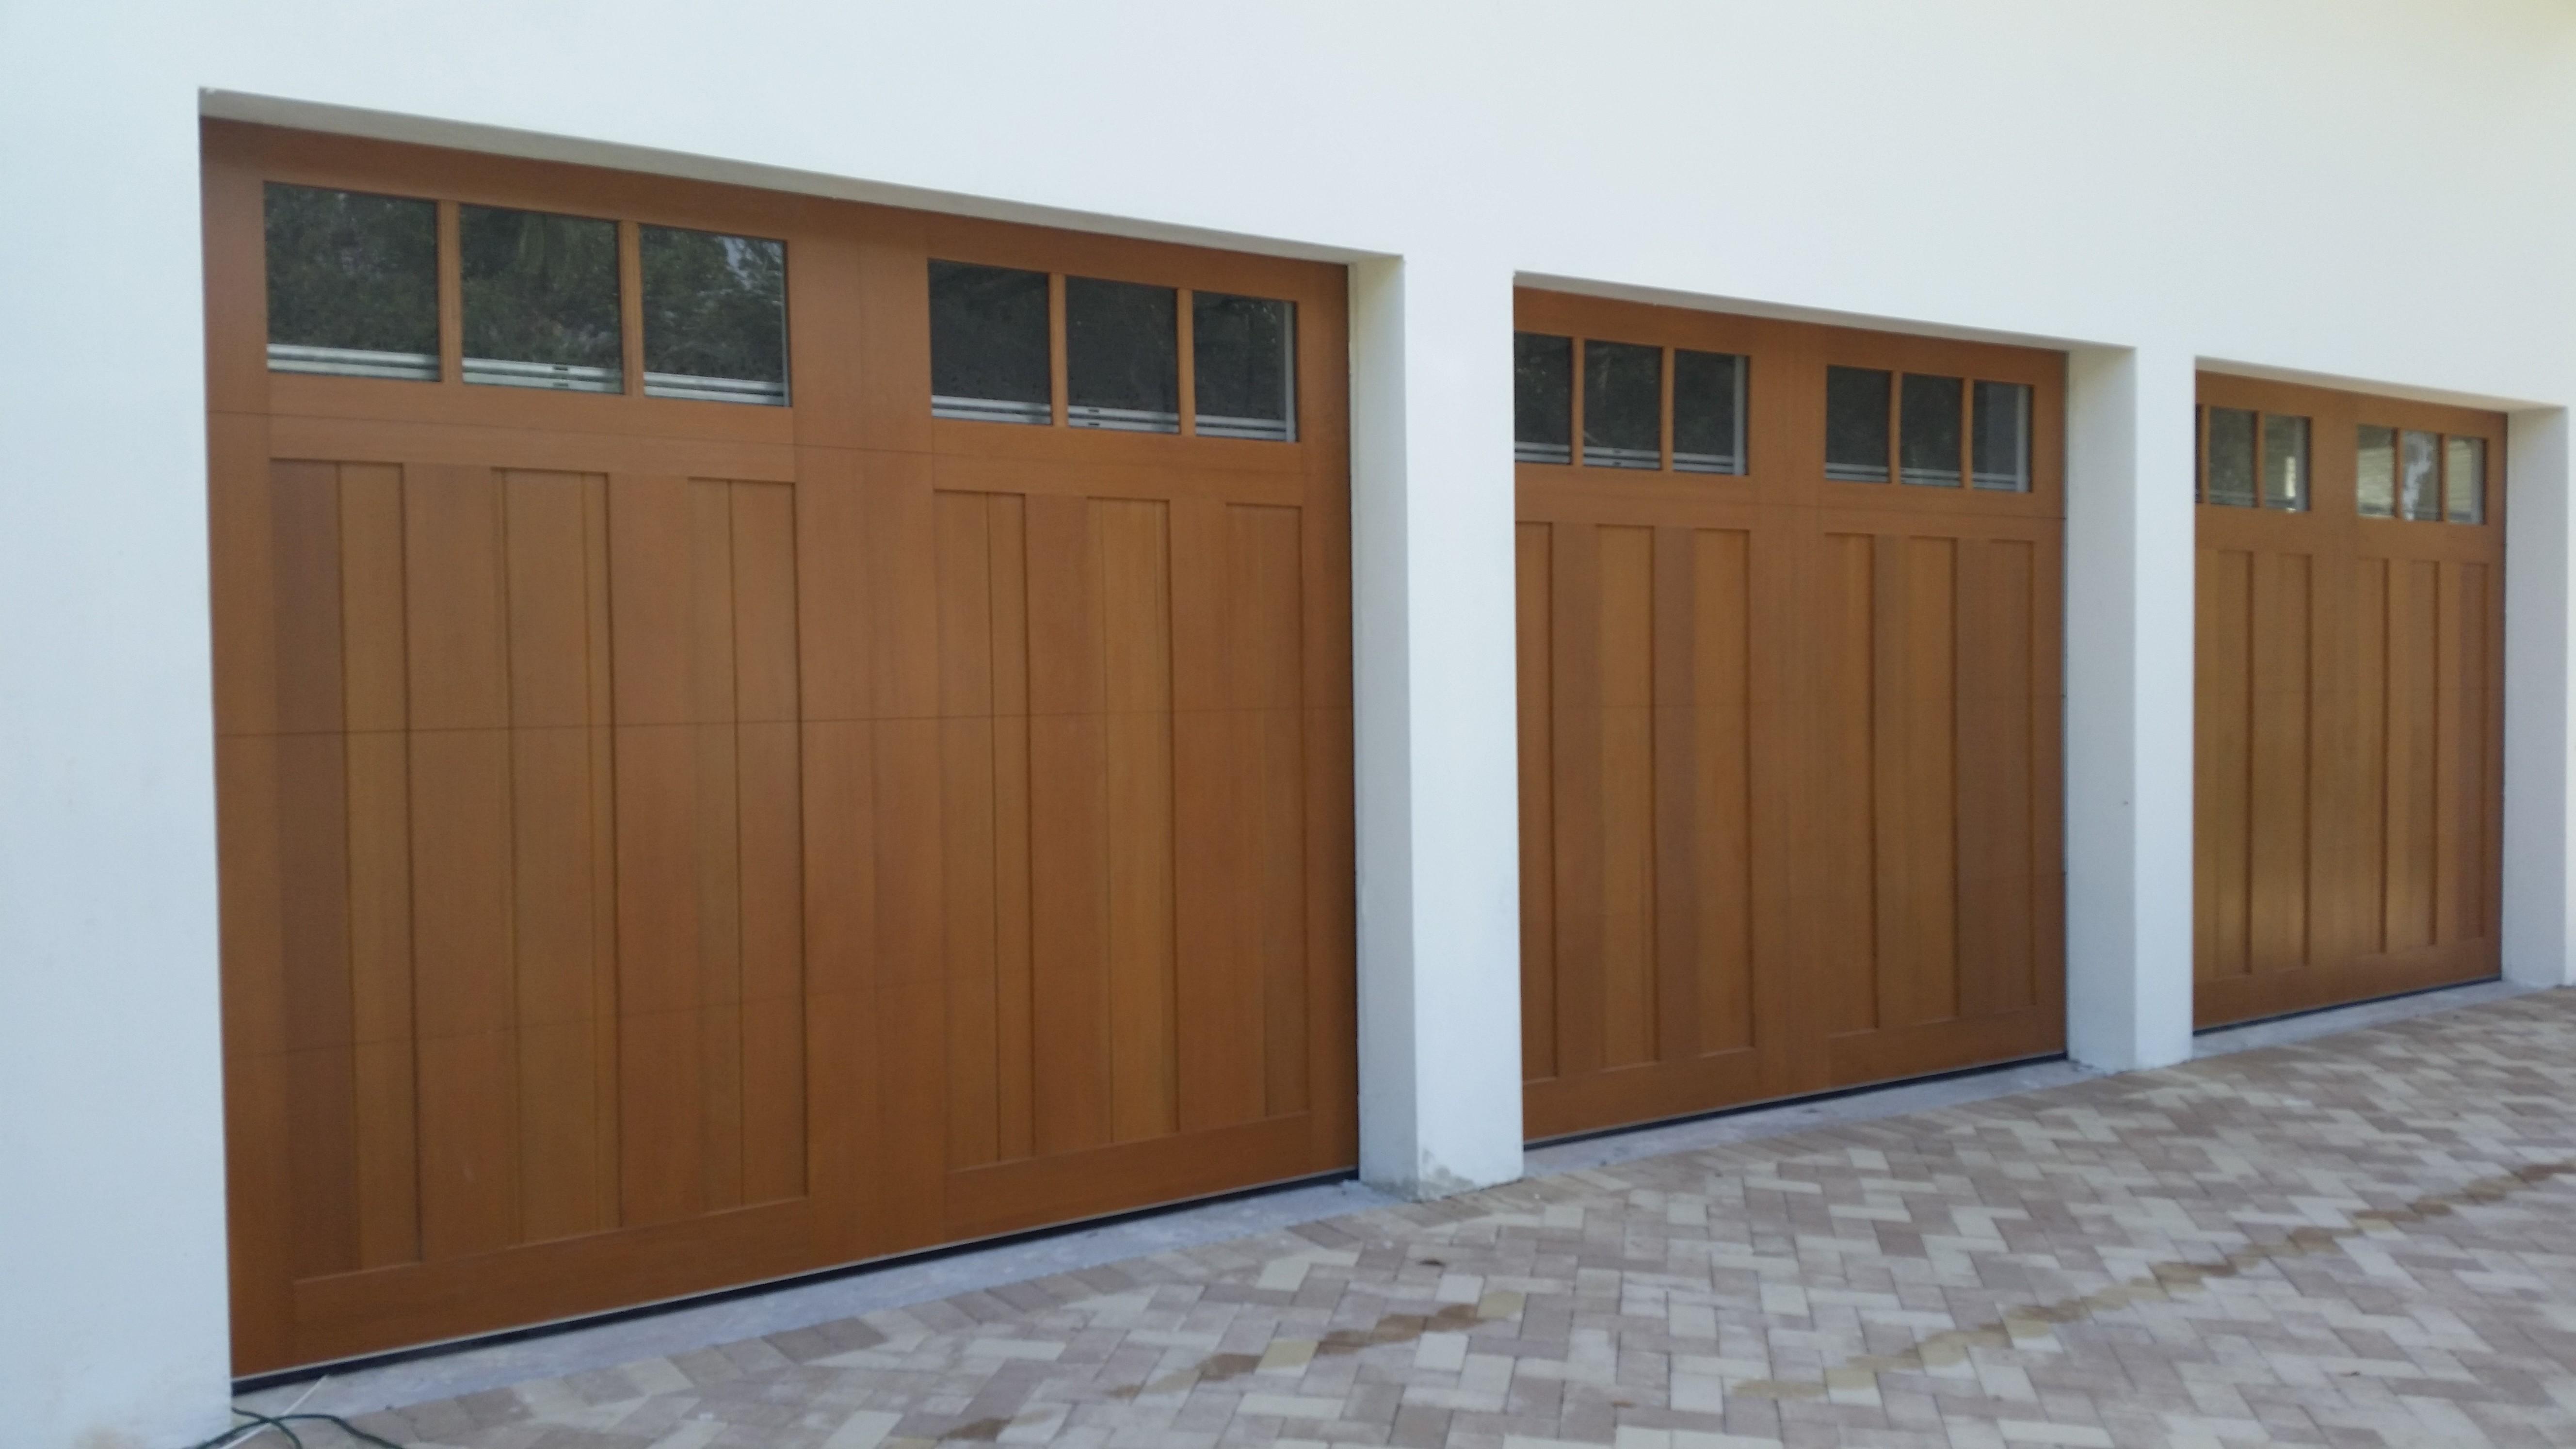 lauderdale resale ft pines door estate sw in closed palms for cobblestone repair life highest garage fl rodriguez the pembroke terrace real oscar